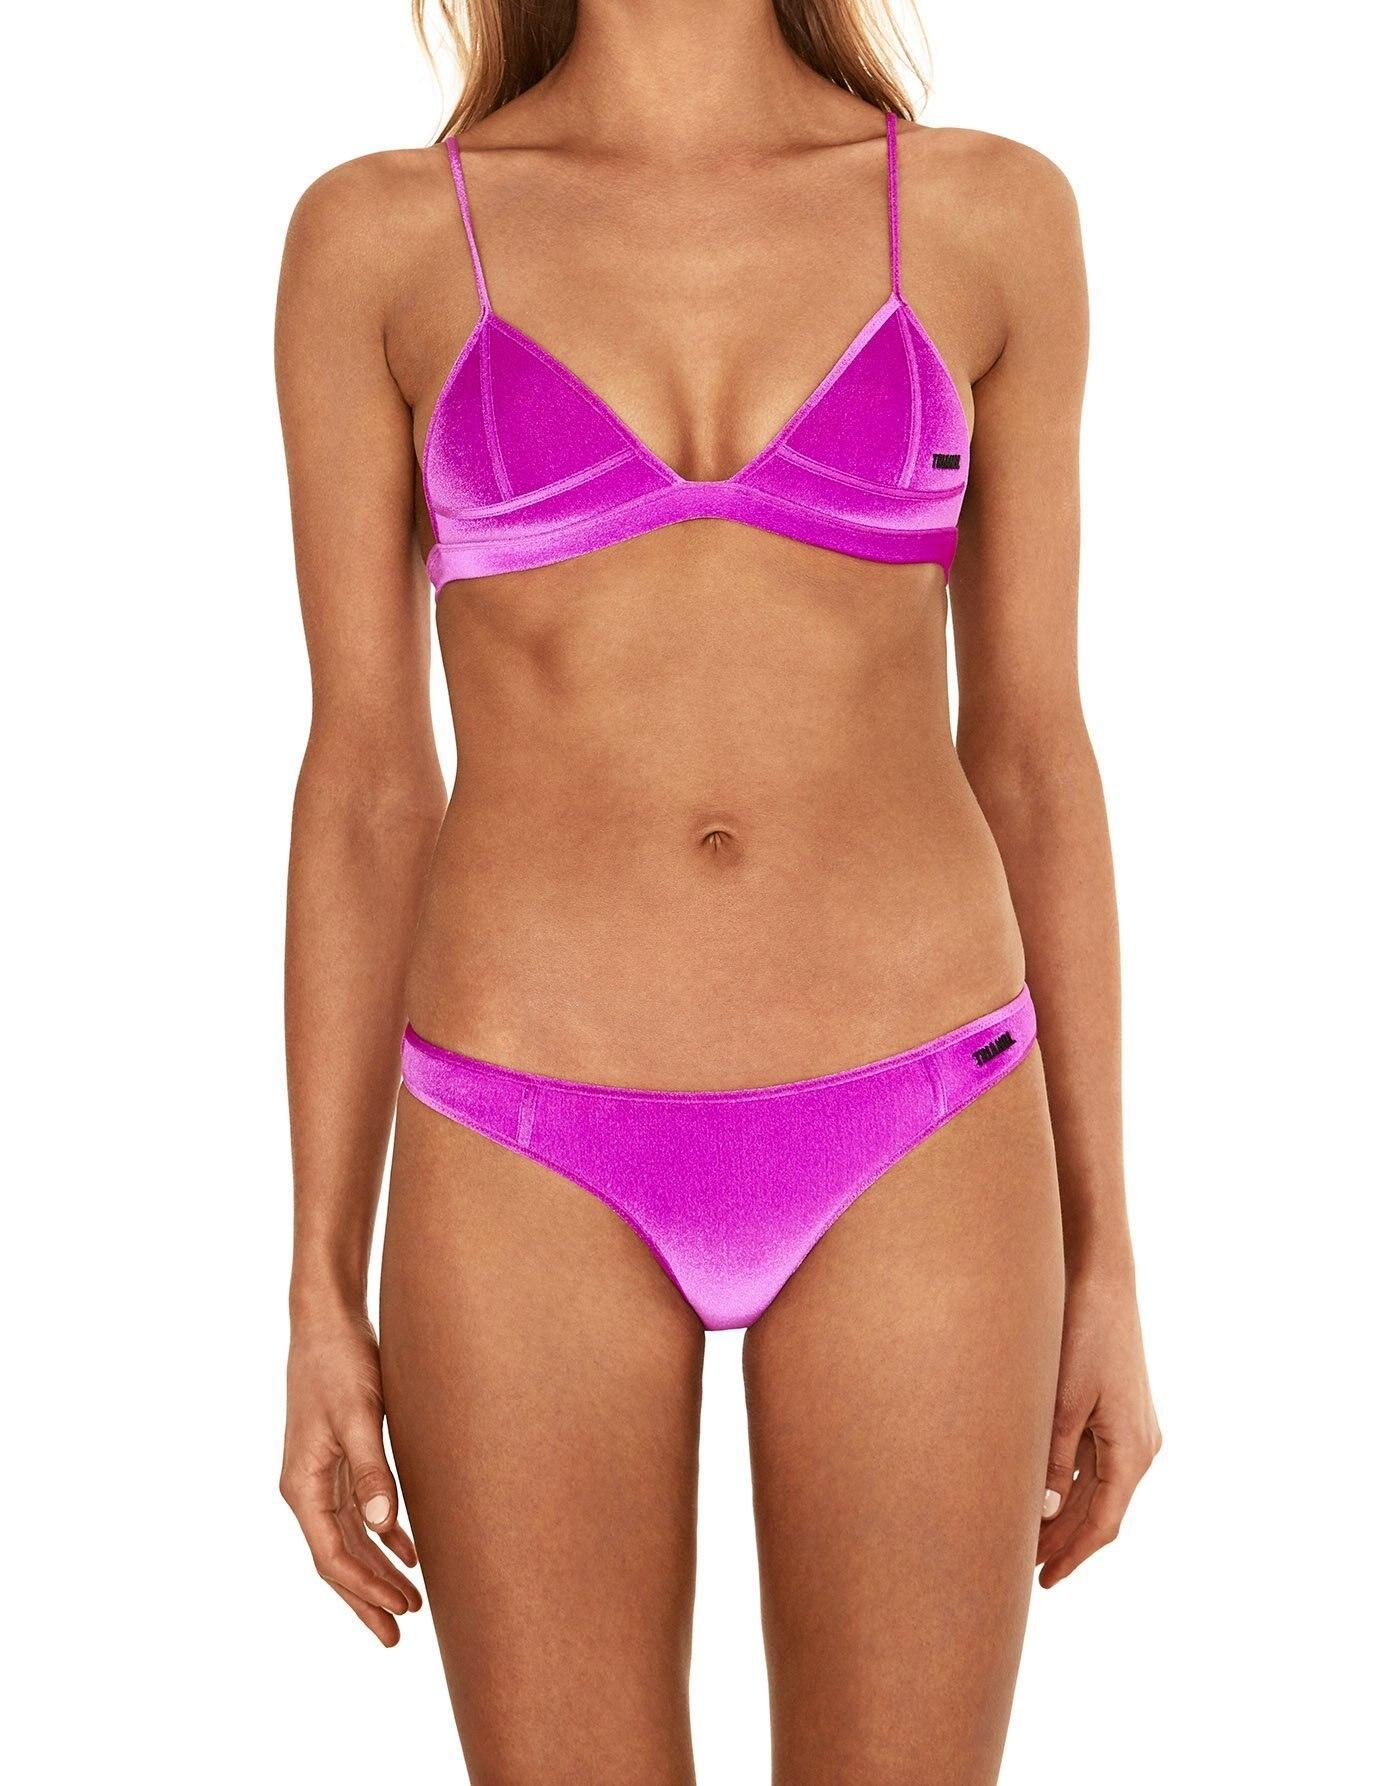 SHESHOT rouge TRIANGL twister-sour raisins maillots de bain femmes VS INSROXY Original usine commande taille haute bikini ensembles 2019 maillot de bain